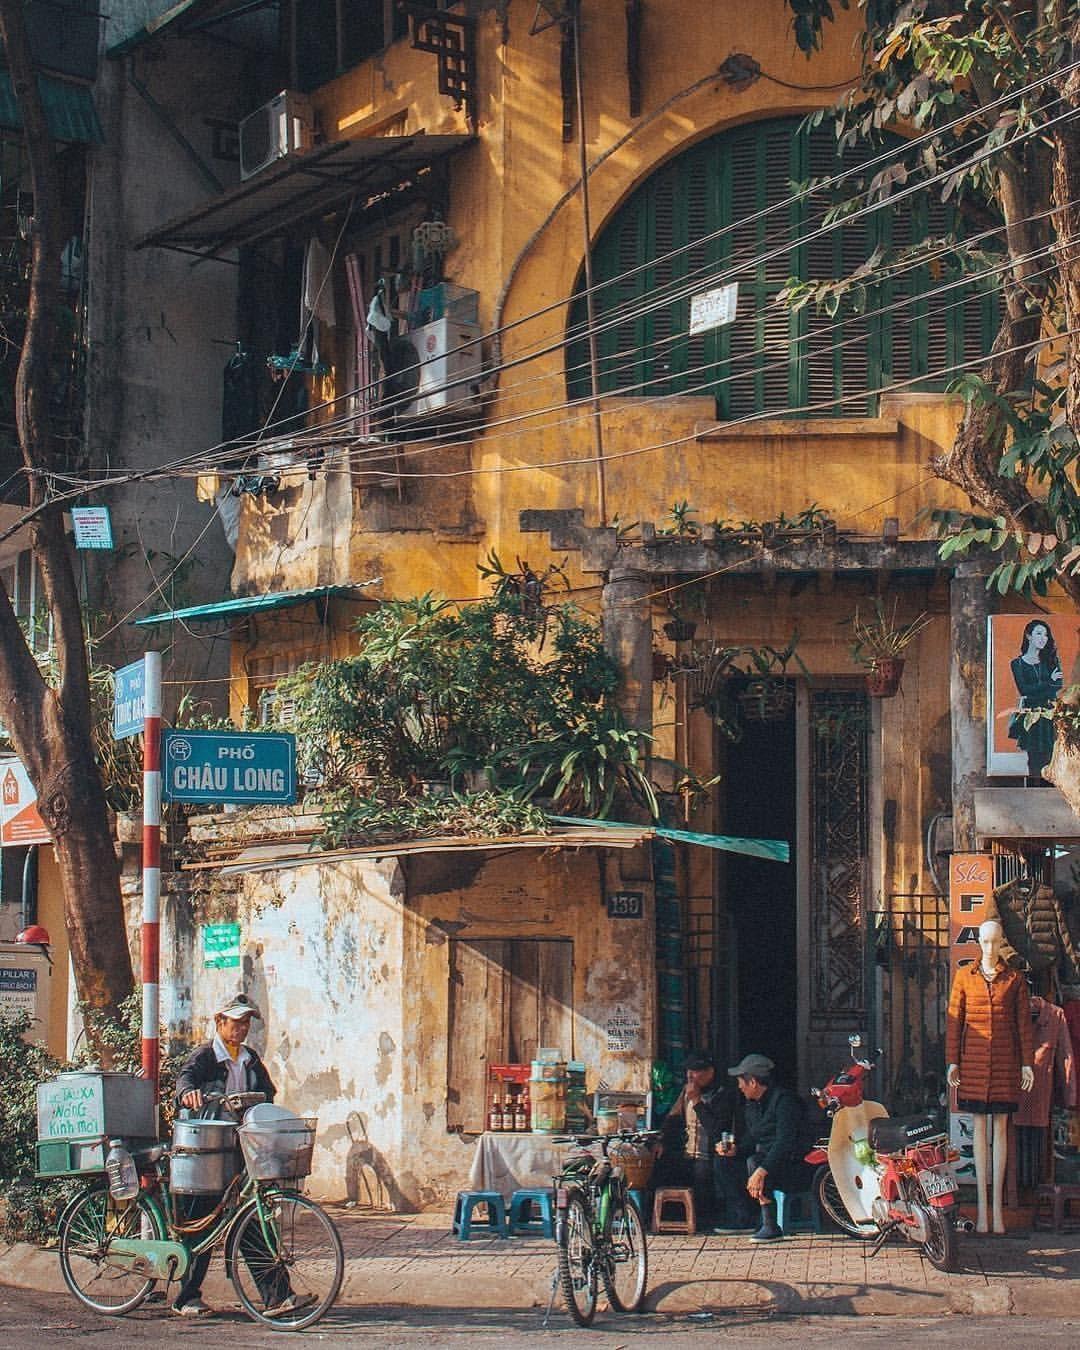 "2,075 Likes, 32 Comments - Hanoi - Vietnam 🇻🇳🇻🇳 (@hanoicapital) on Instagram: ""Good morning Hanoi. Isn't it easy…   Hanoi, Street photography, Beautiful vietnam"